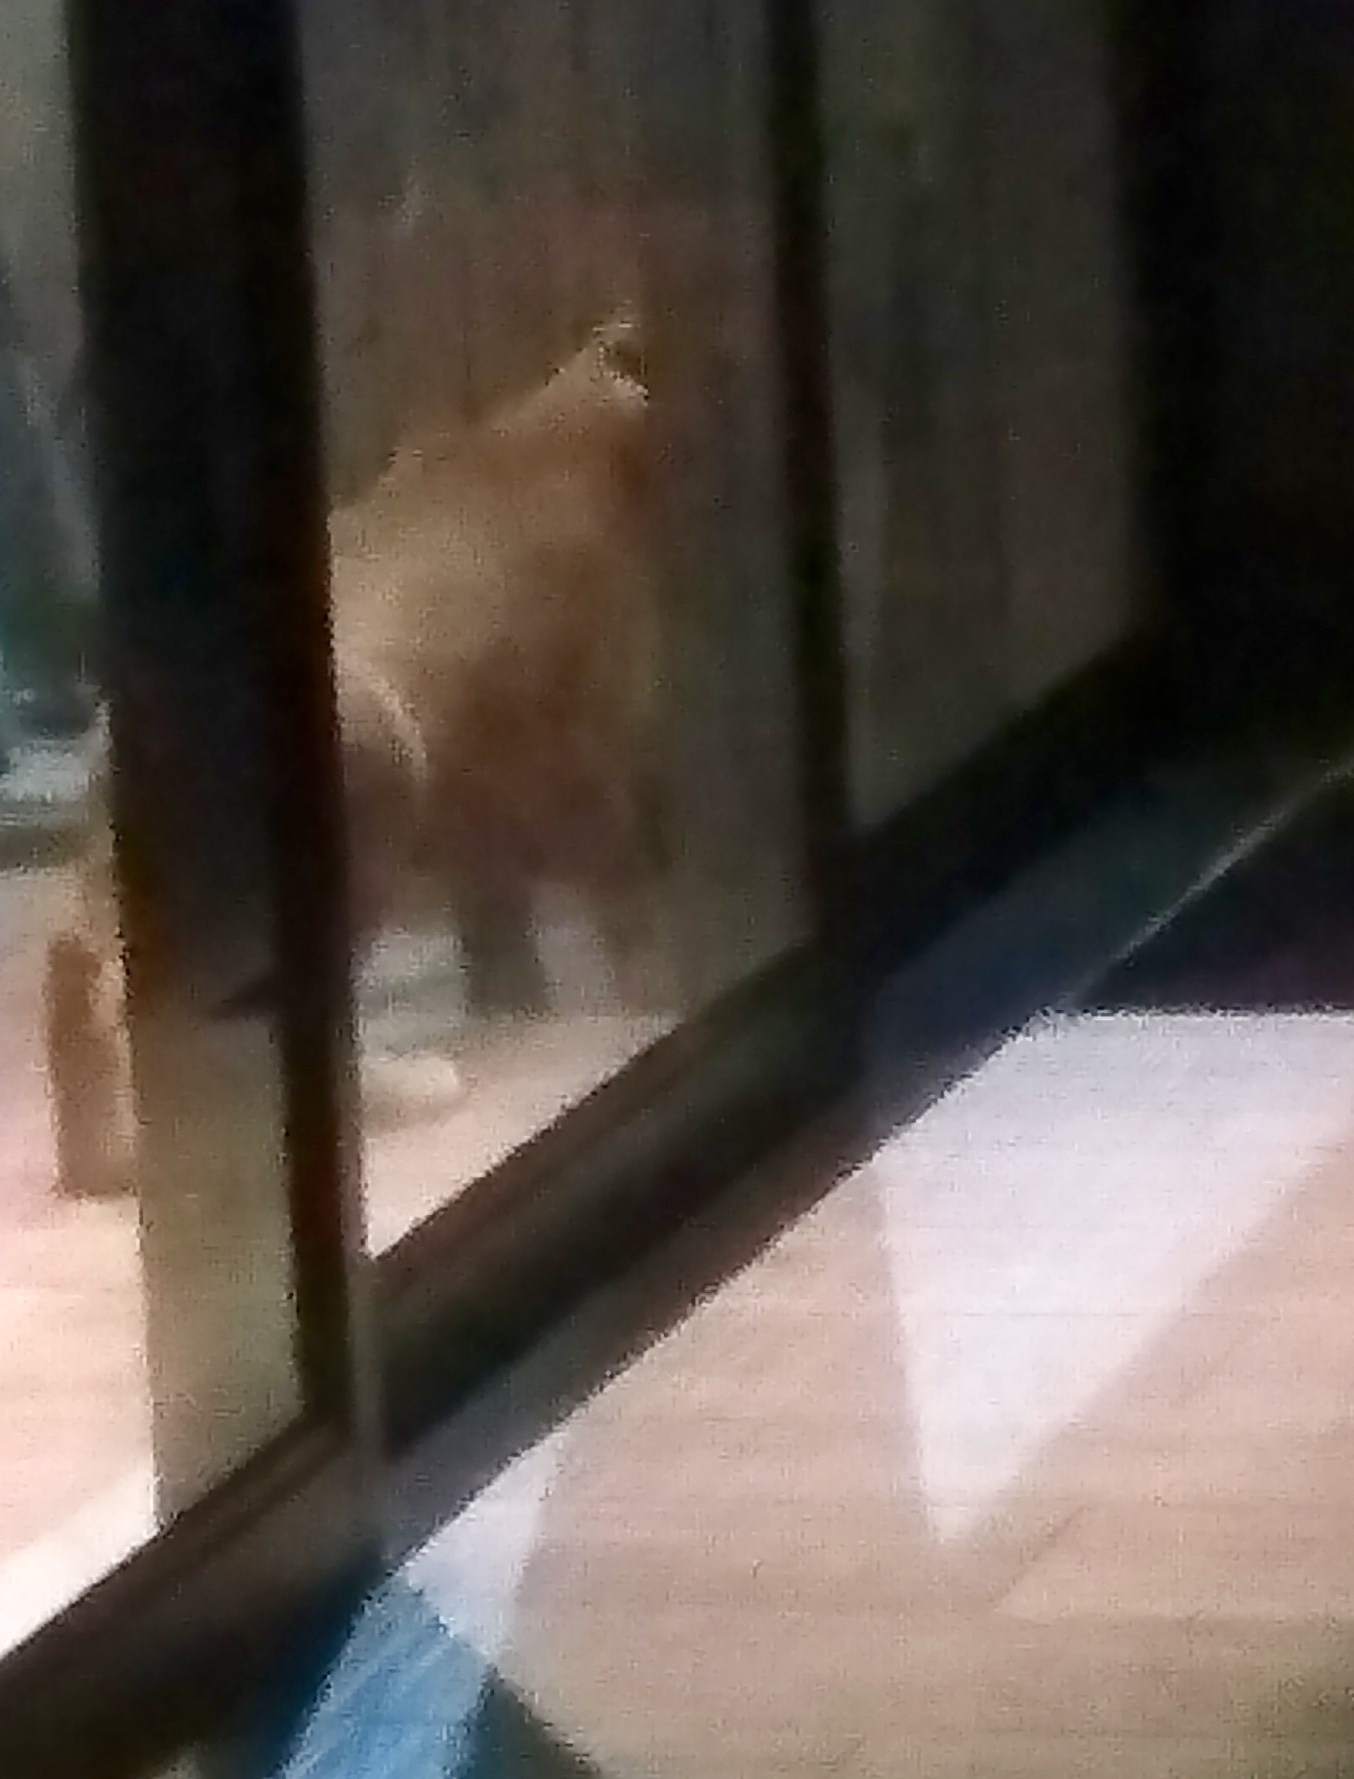 Caracal at the door